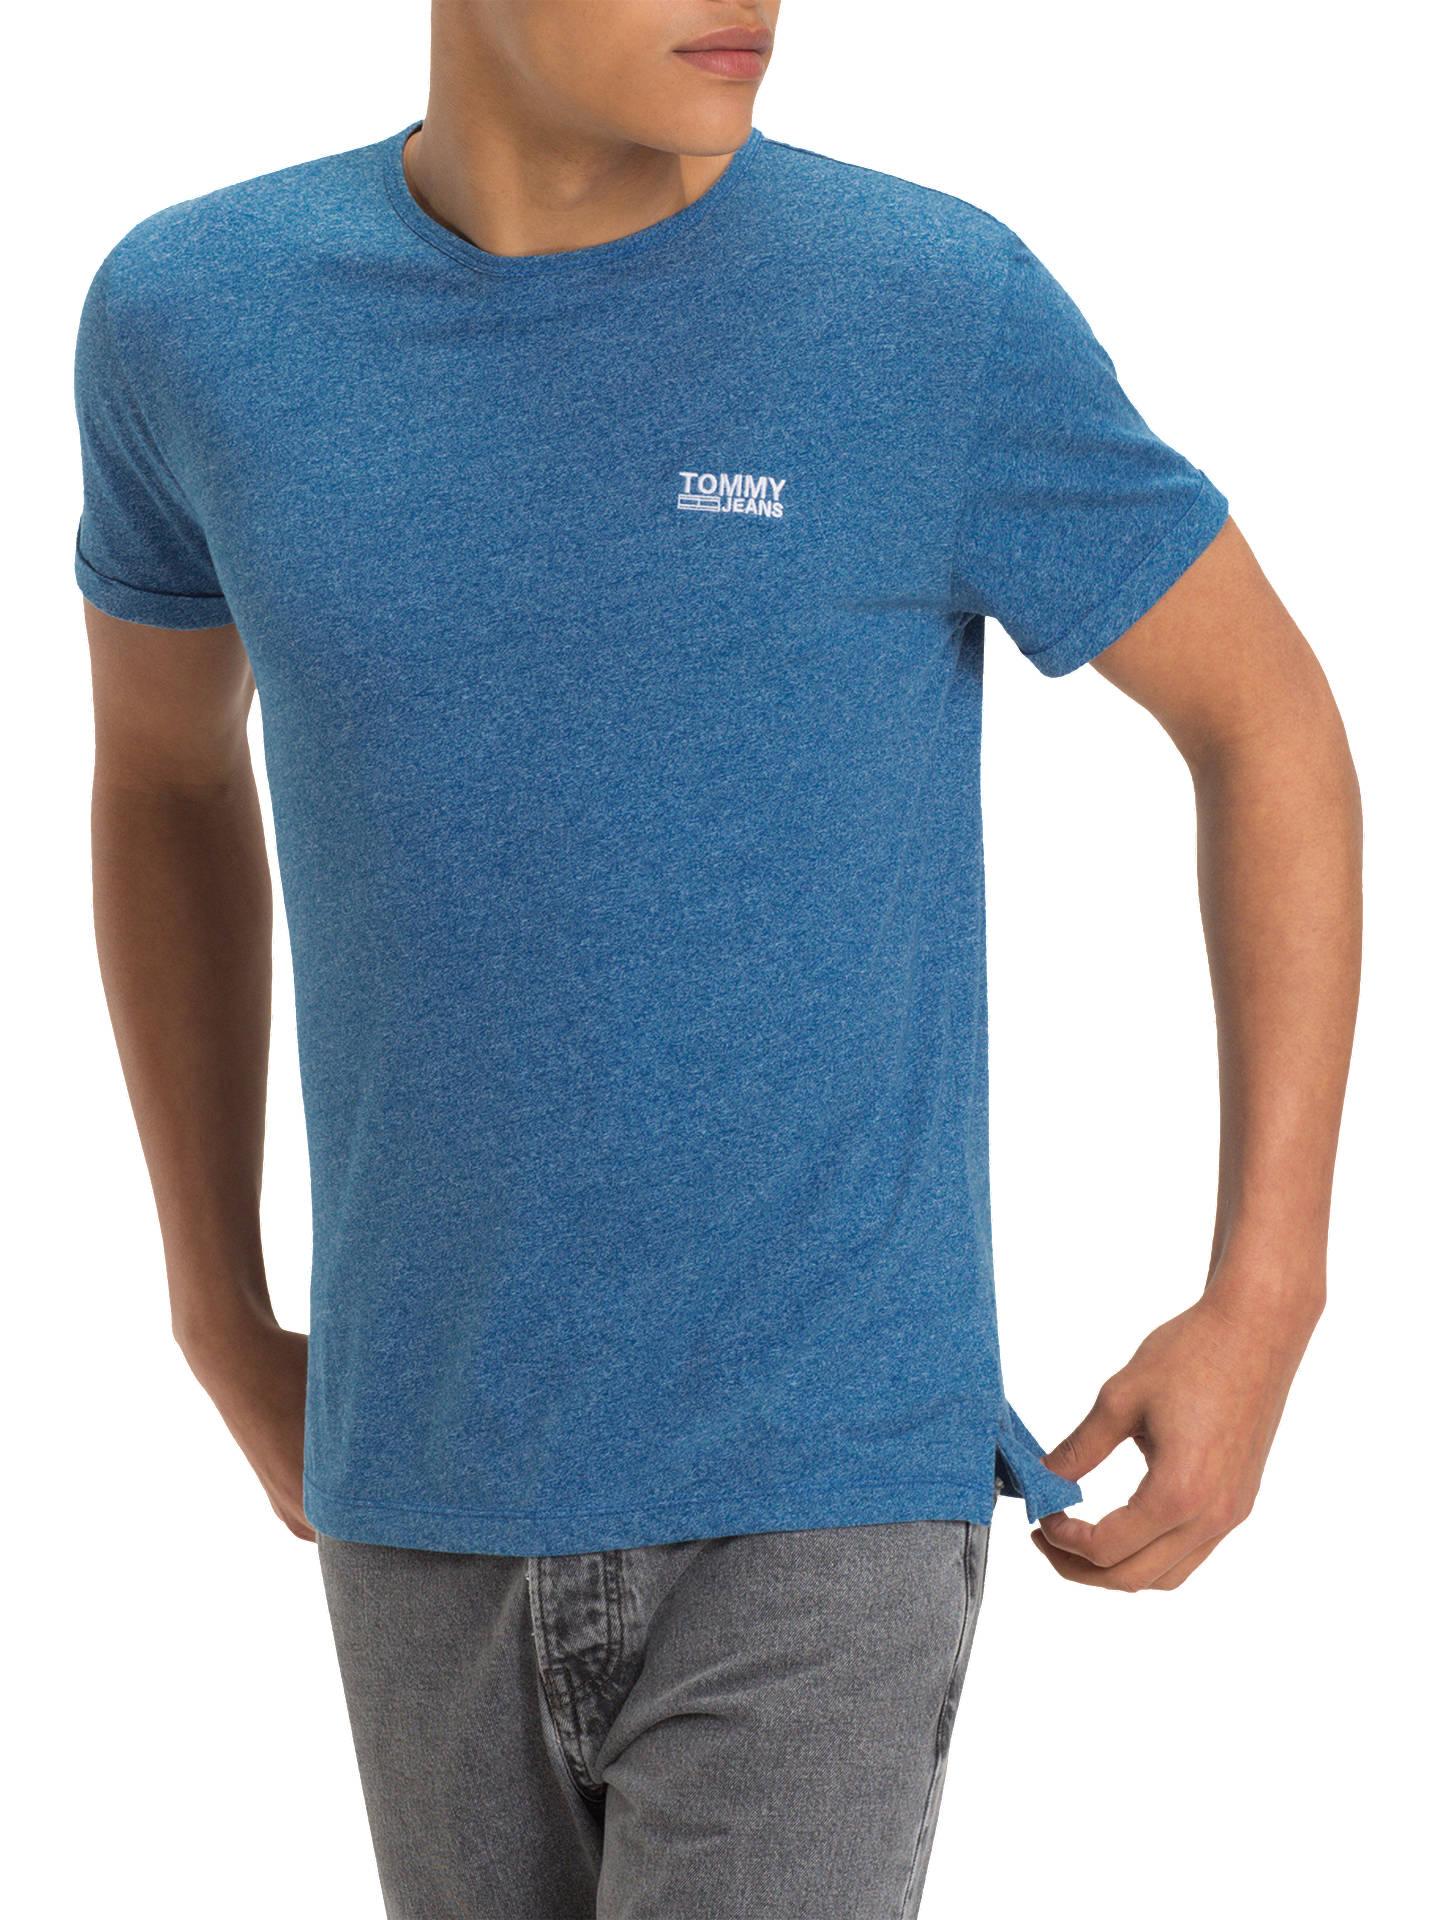 ed4cd3b79 Buy Tommy Jeans Modern Jaspe Crew Neck T-Shirt, Blue, XL Online at ...